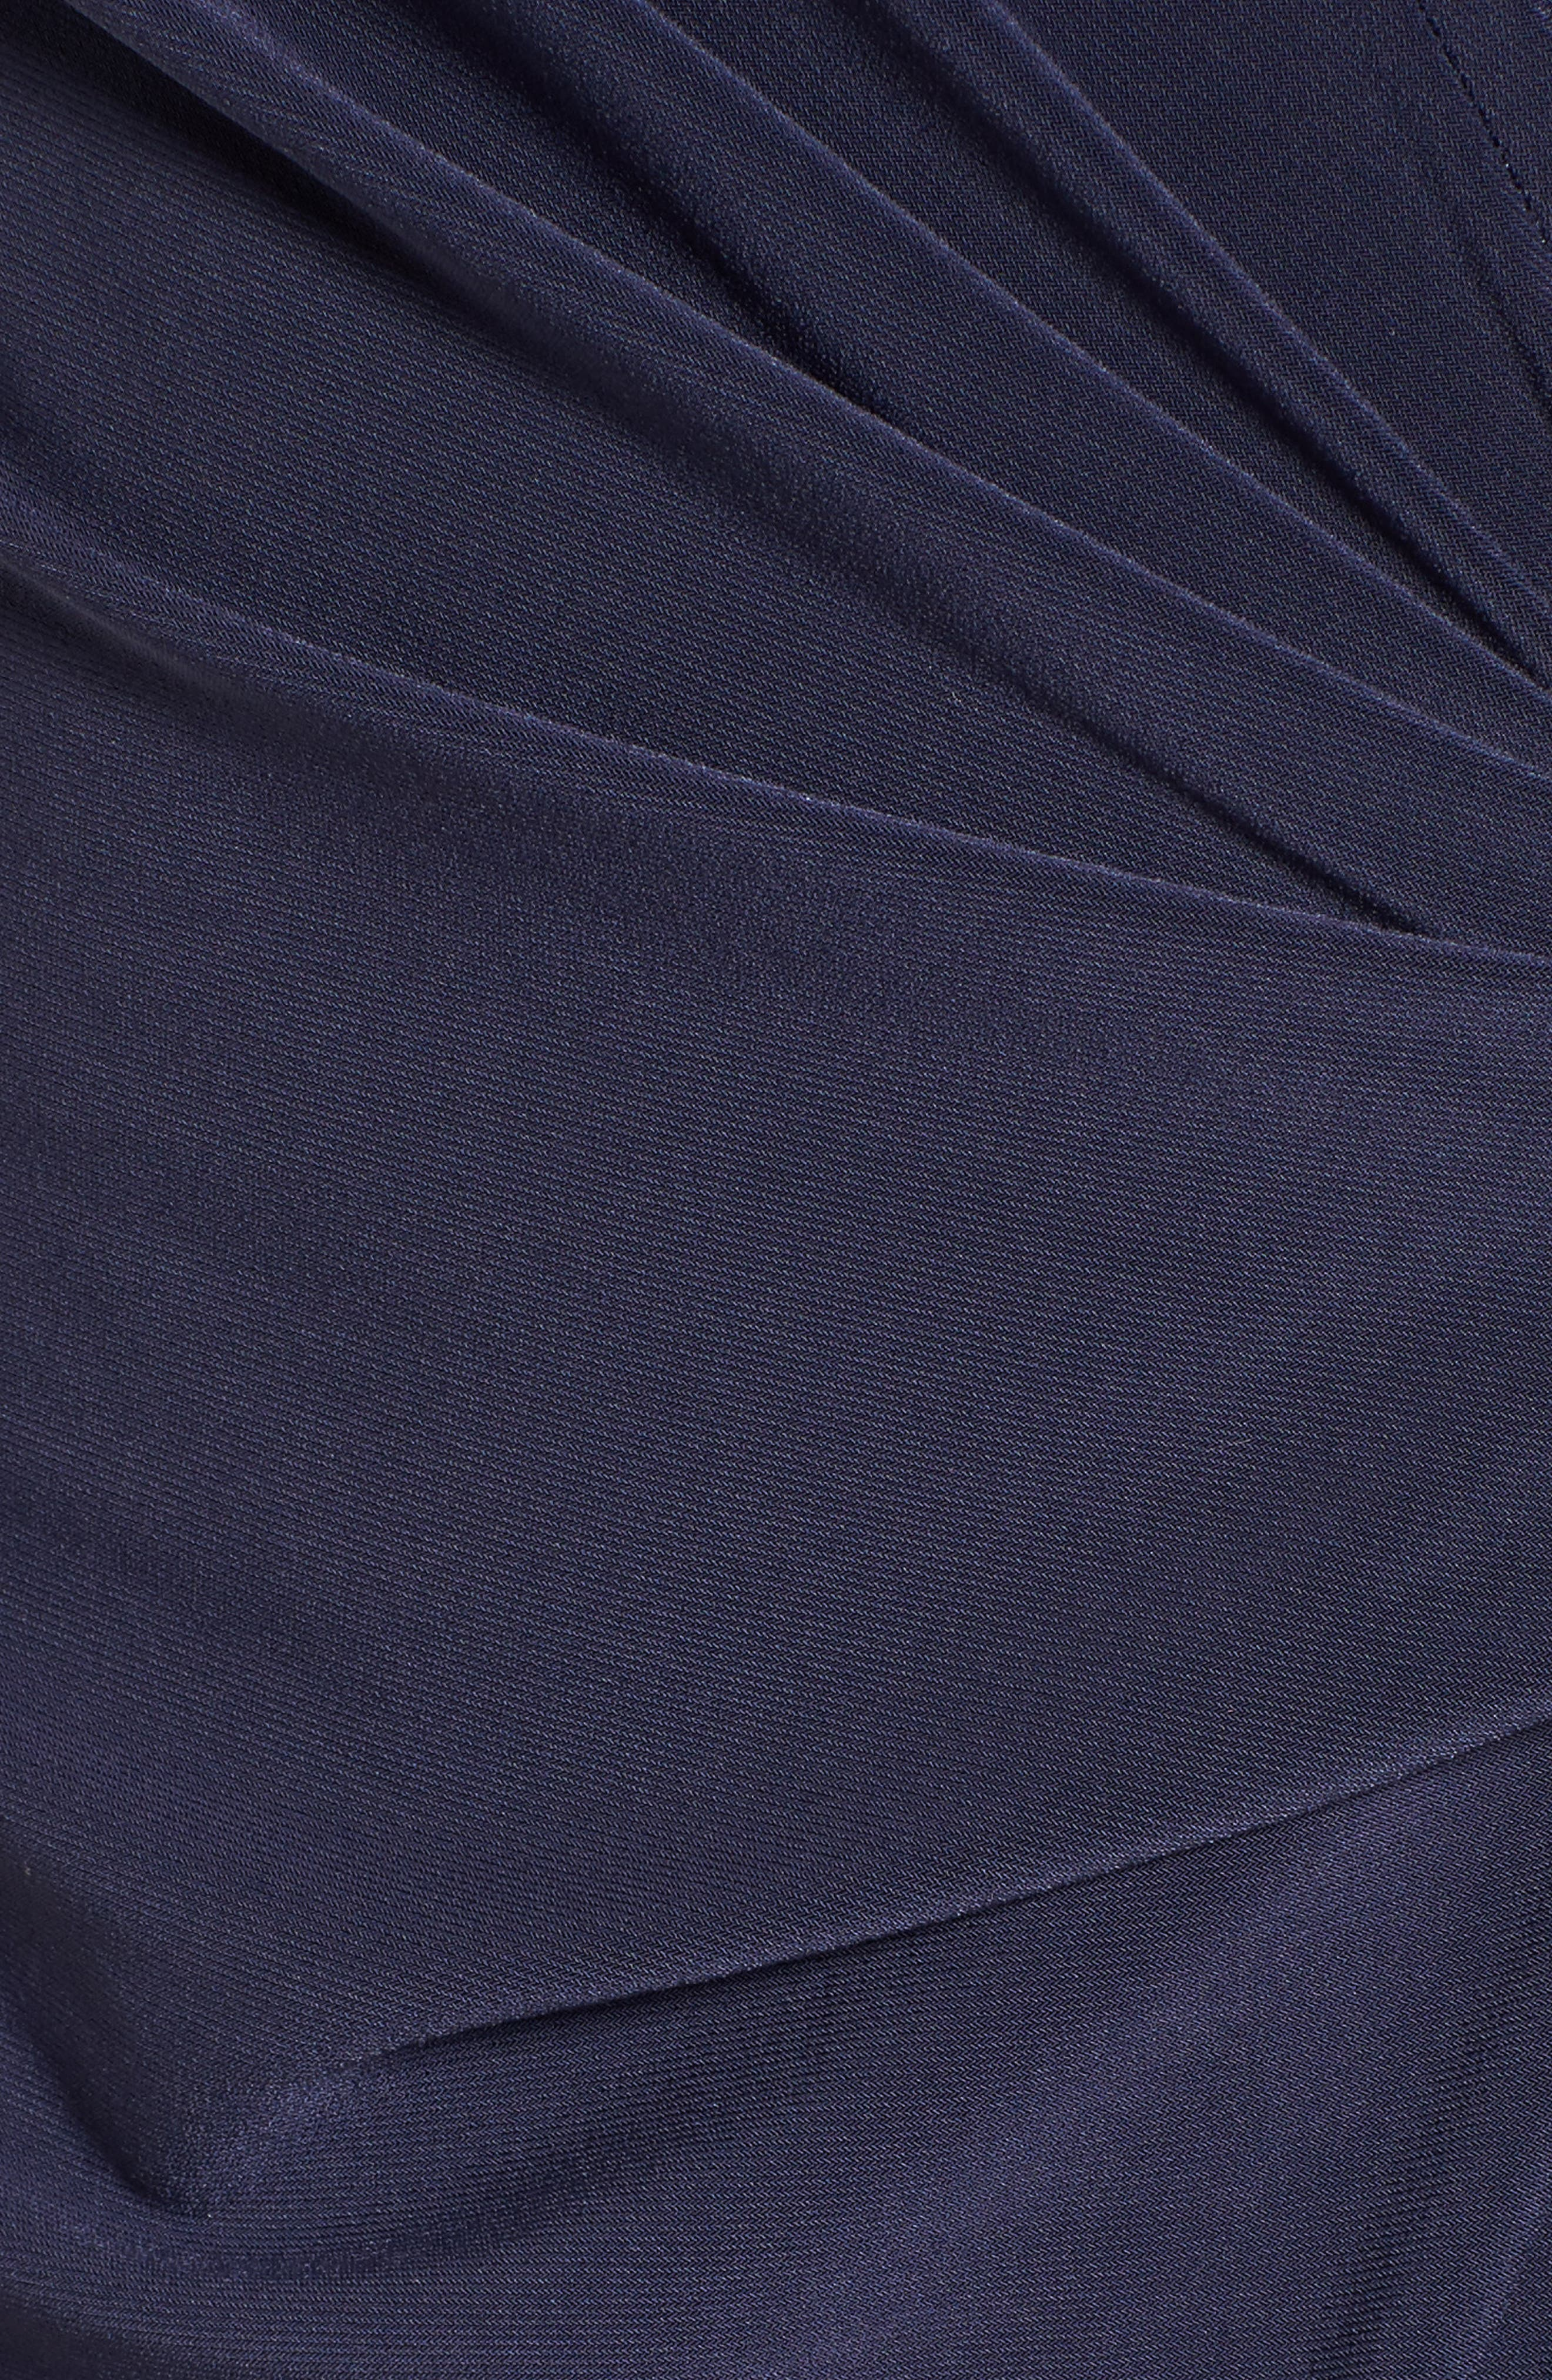 Jersey Faux Wrap Dress,                             Alternate thumbnail 5, color,                             Dark Indigo